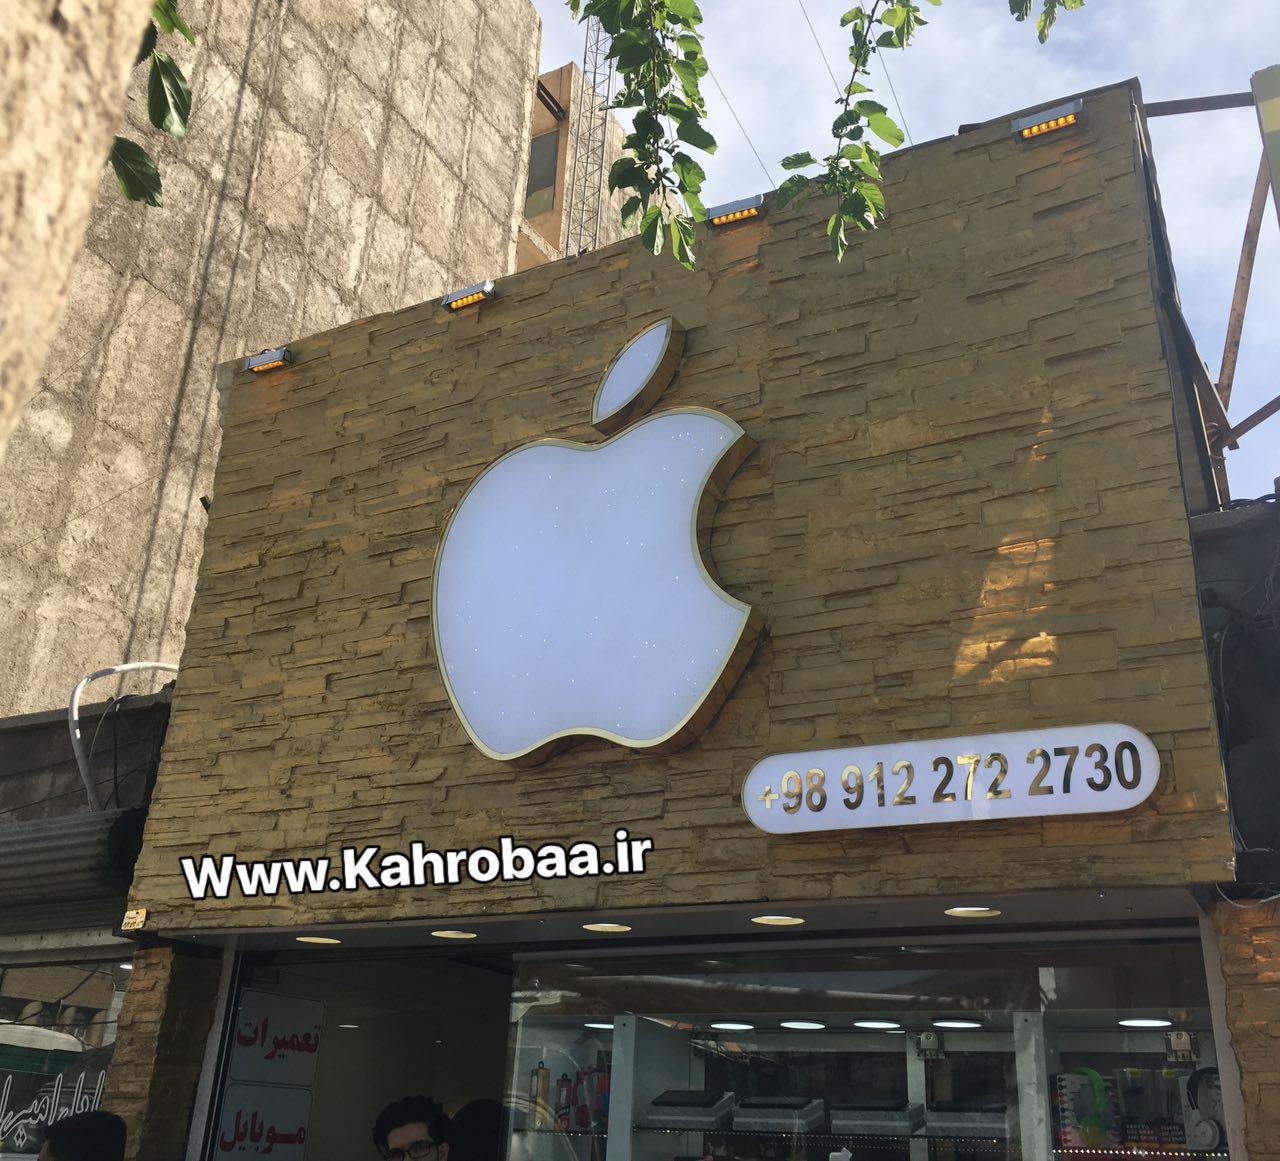 چلنیوم کامپوزیت حروف برجسته چنلیوم آرم اپل اپل استور